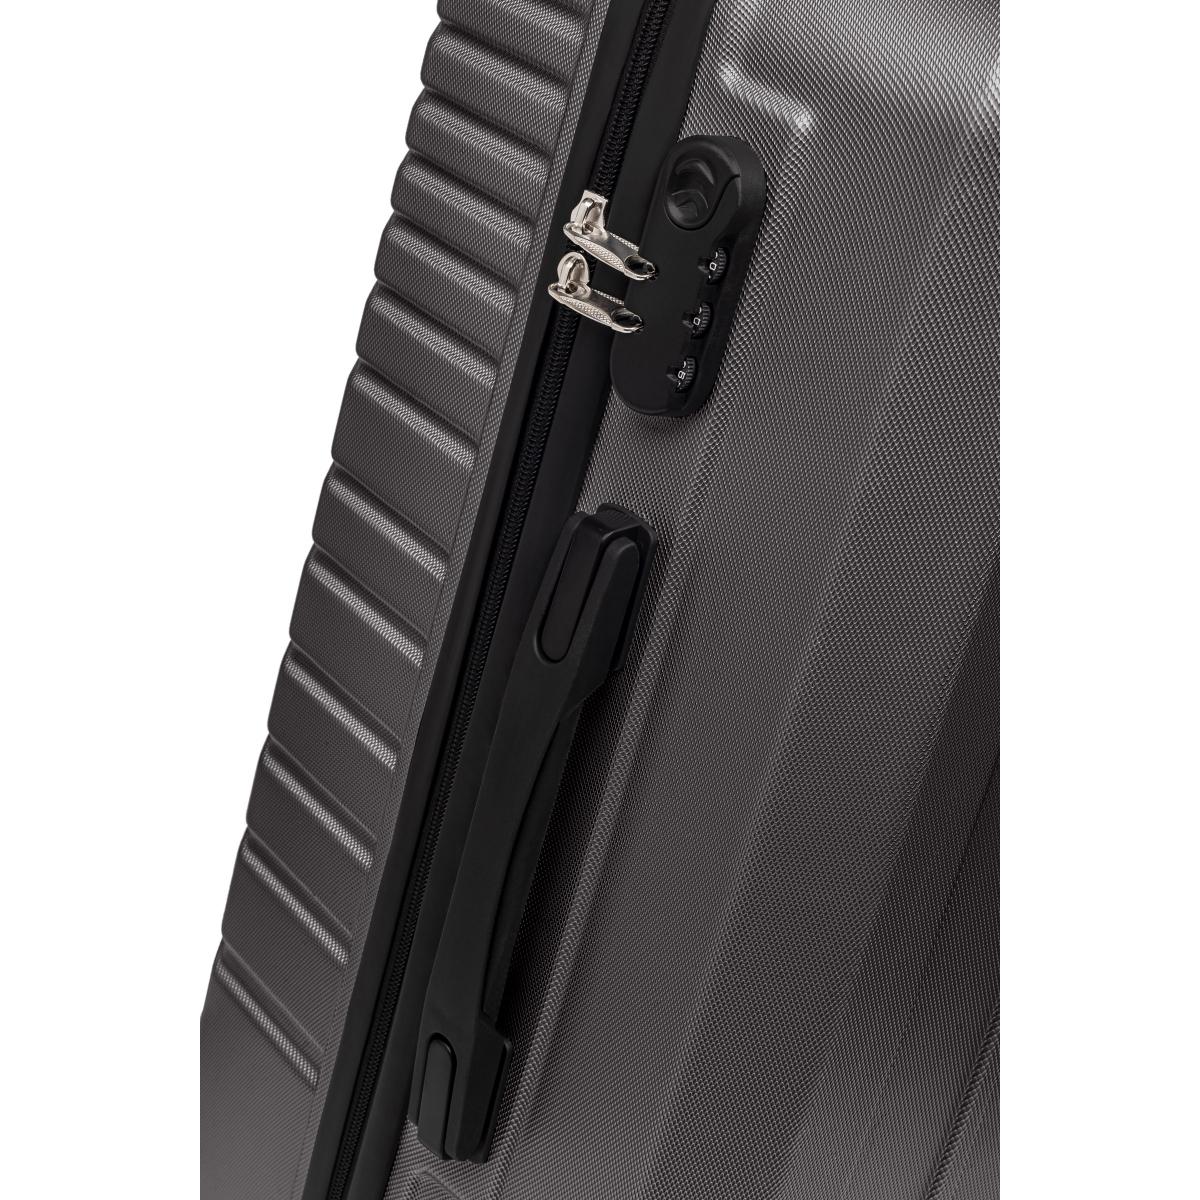 Gedox Abs 3'lü Valiz Seyahat Seti - Model:700.02 Koyu Gri